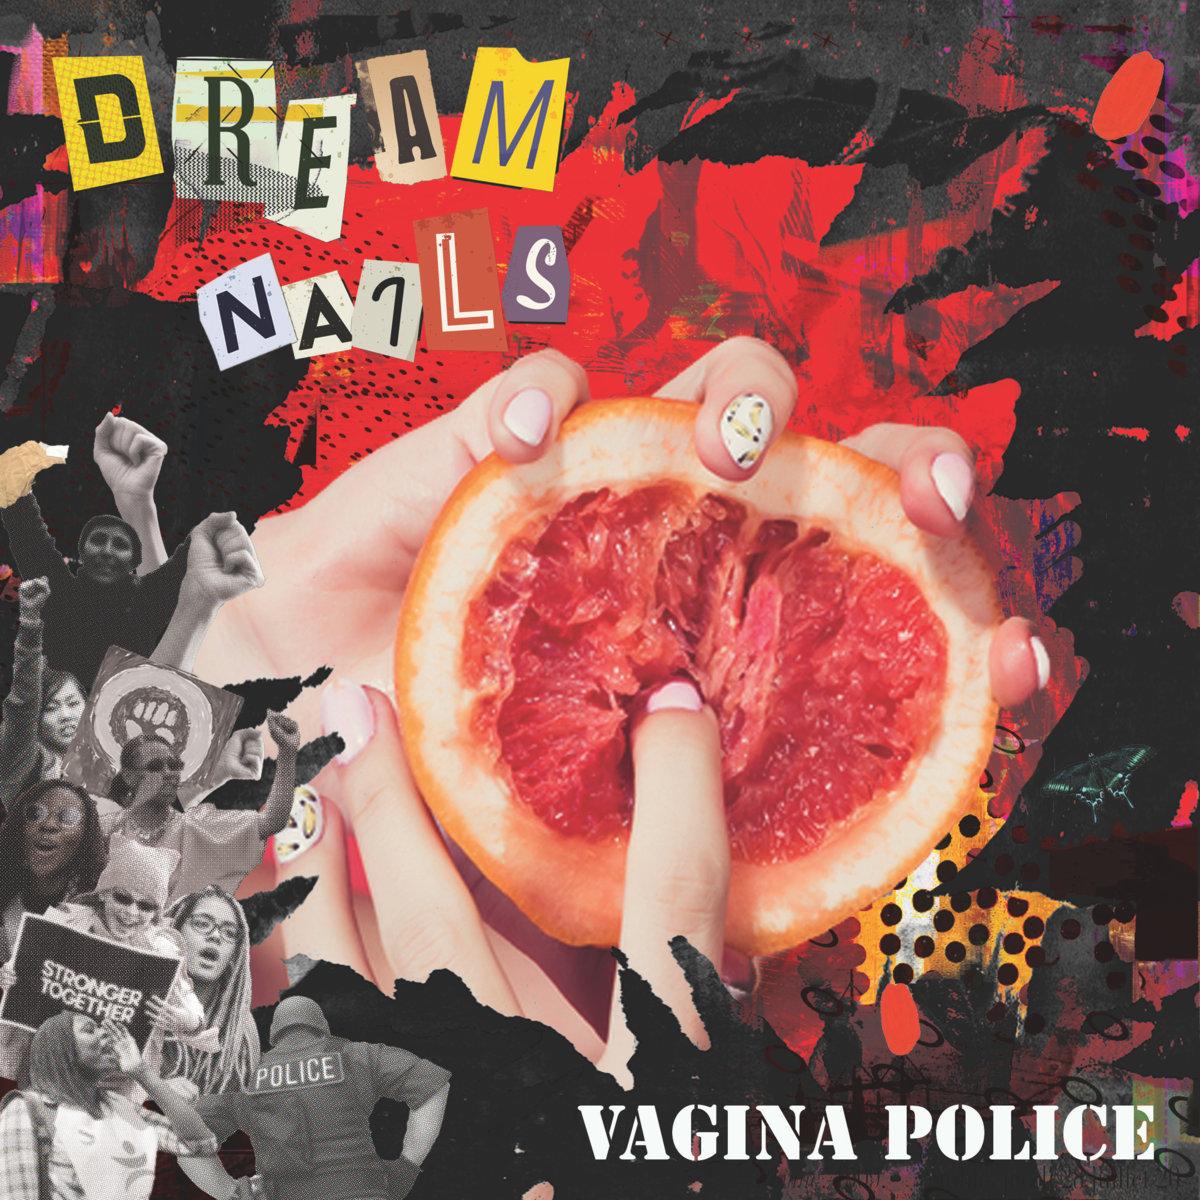 Dream Nails - Vagina Police 7